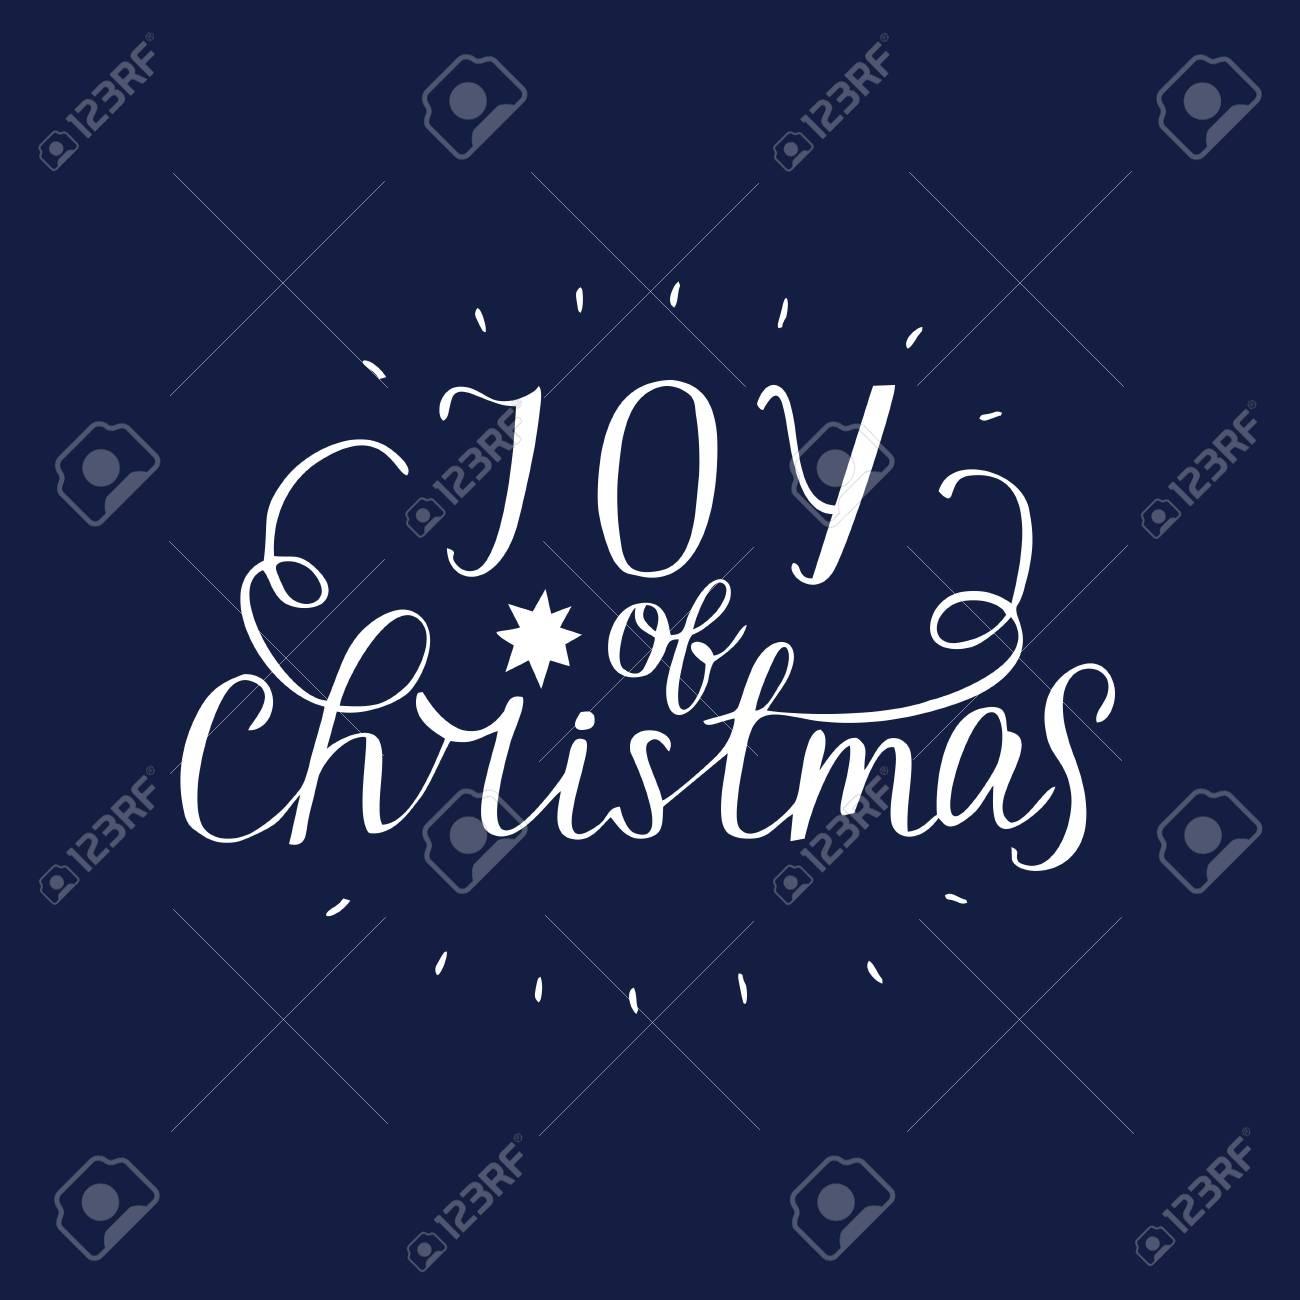 Christmas Background Christian.Hand Lettering Joy Of Christmas Biblical Background Christian